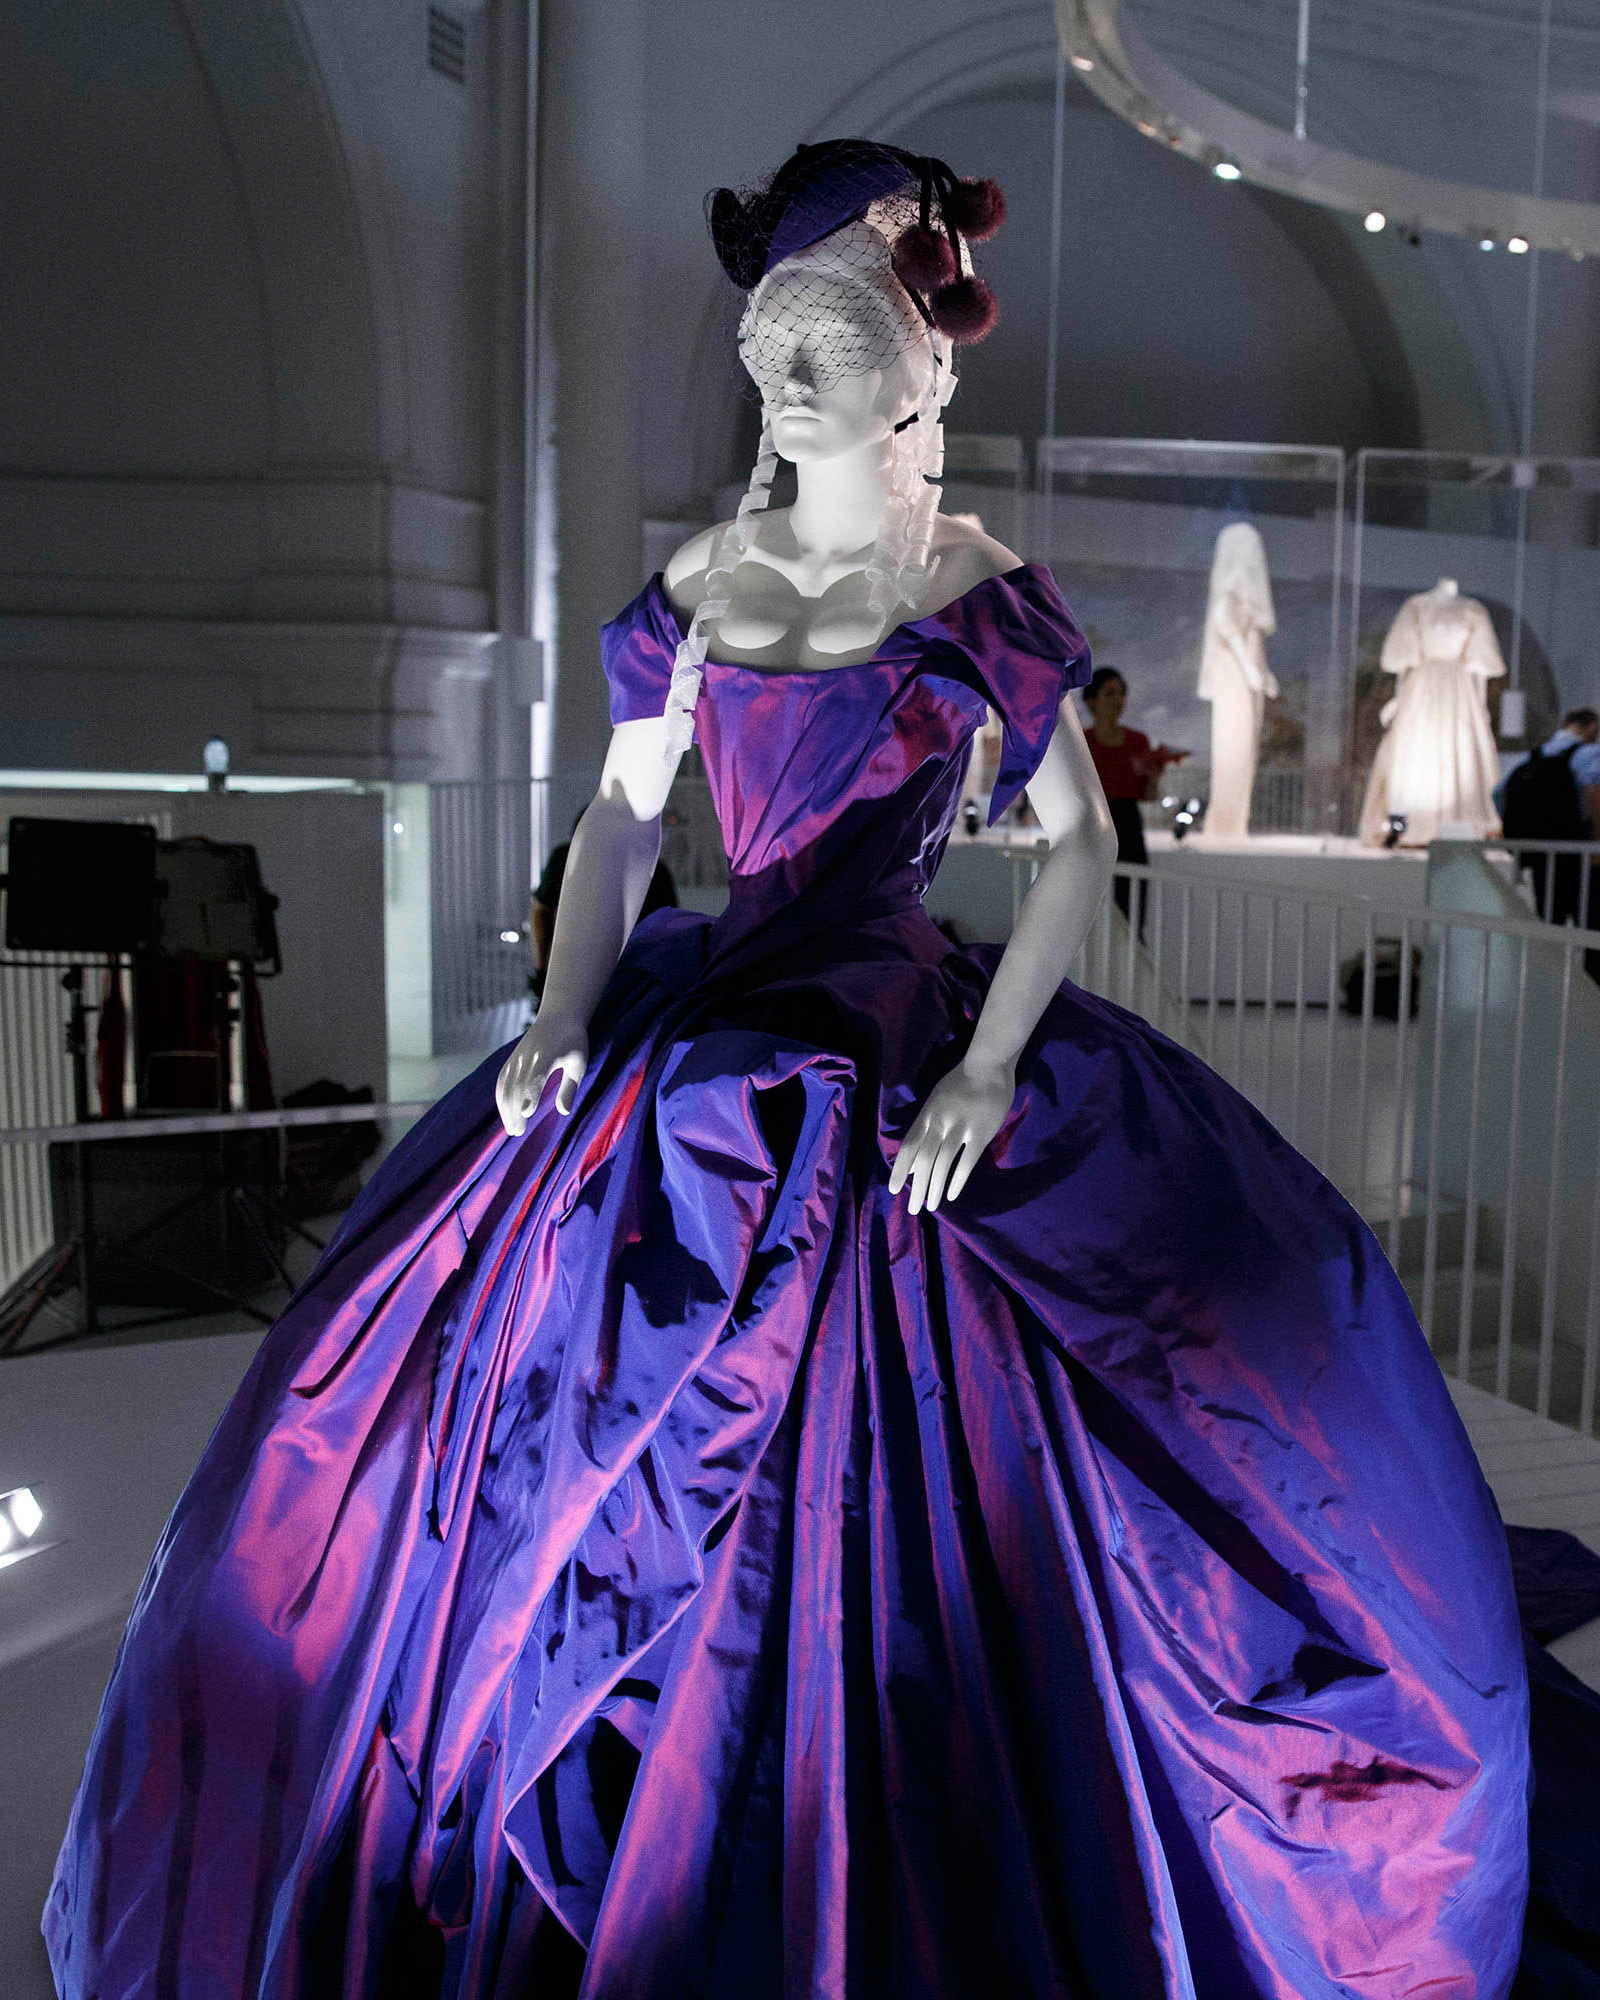 celebrity-colorful-wedding-dresses-dita-von-teese-purple-gettyimages-487437453-0815.jpg